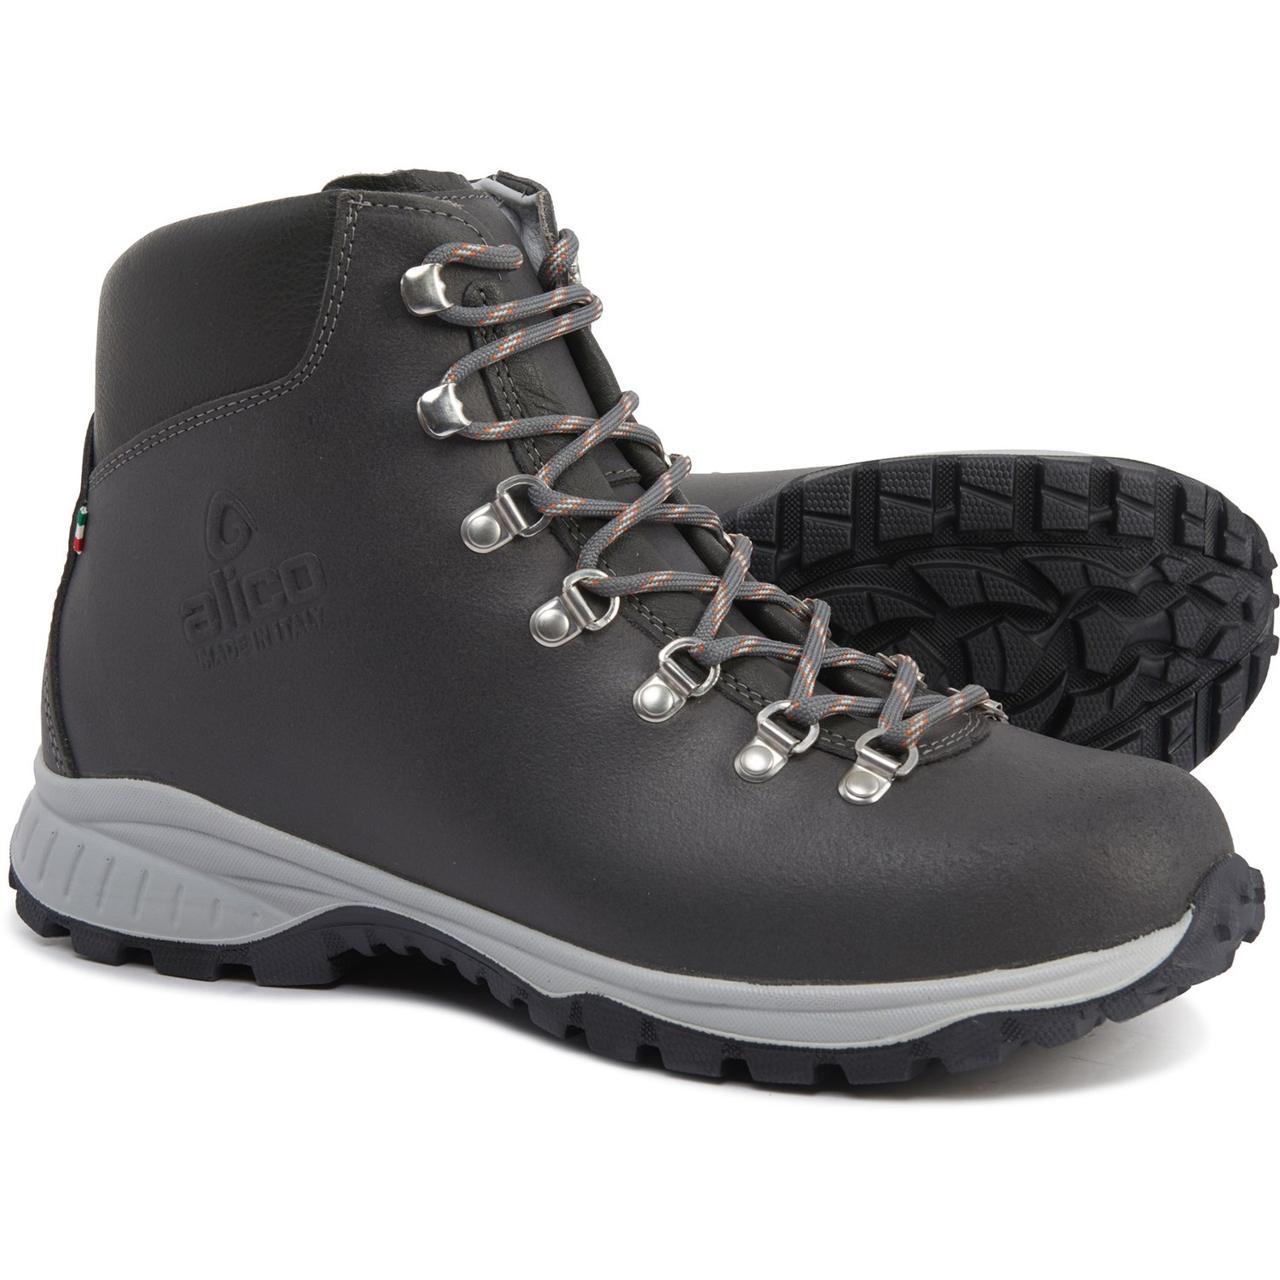 Ботинки трекинговые Alico Sherpa (Код ASHPG-42)